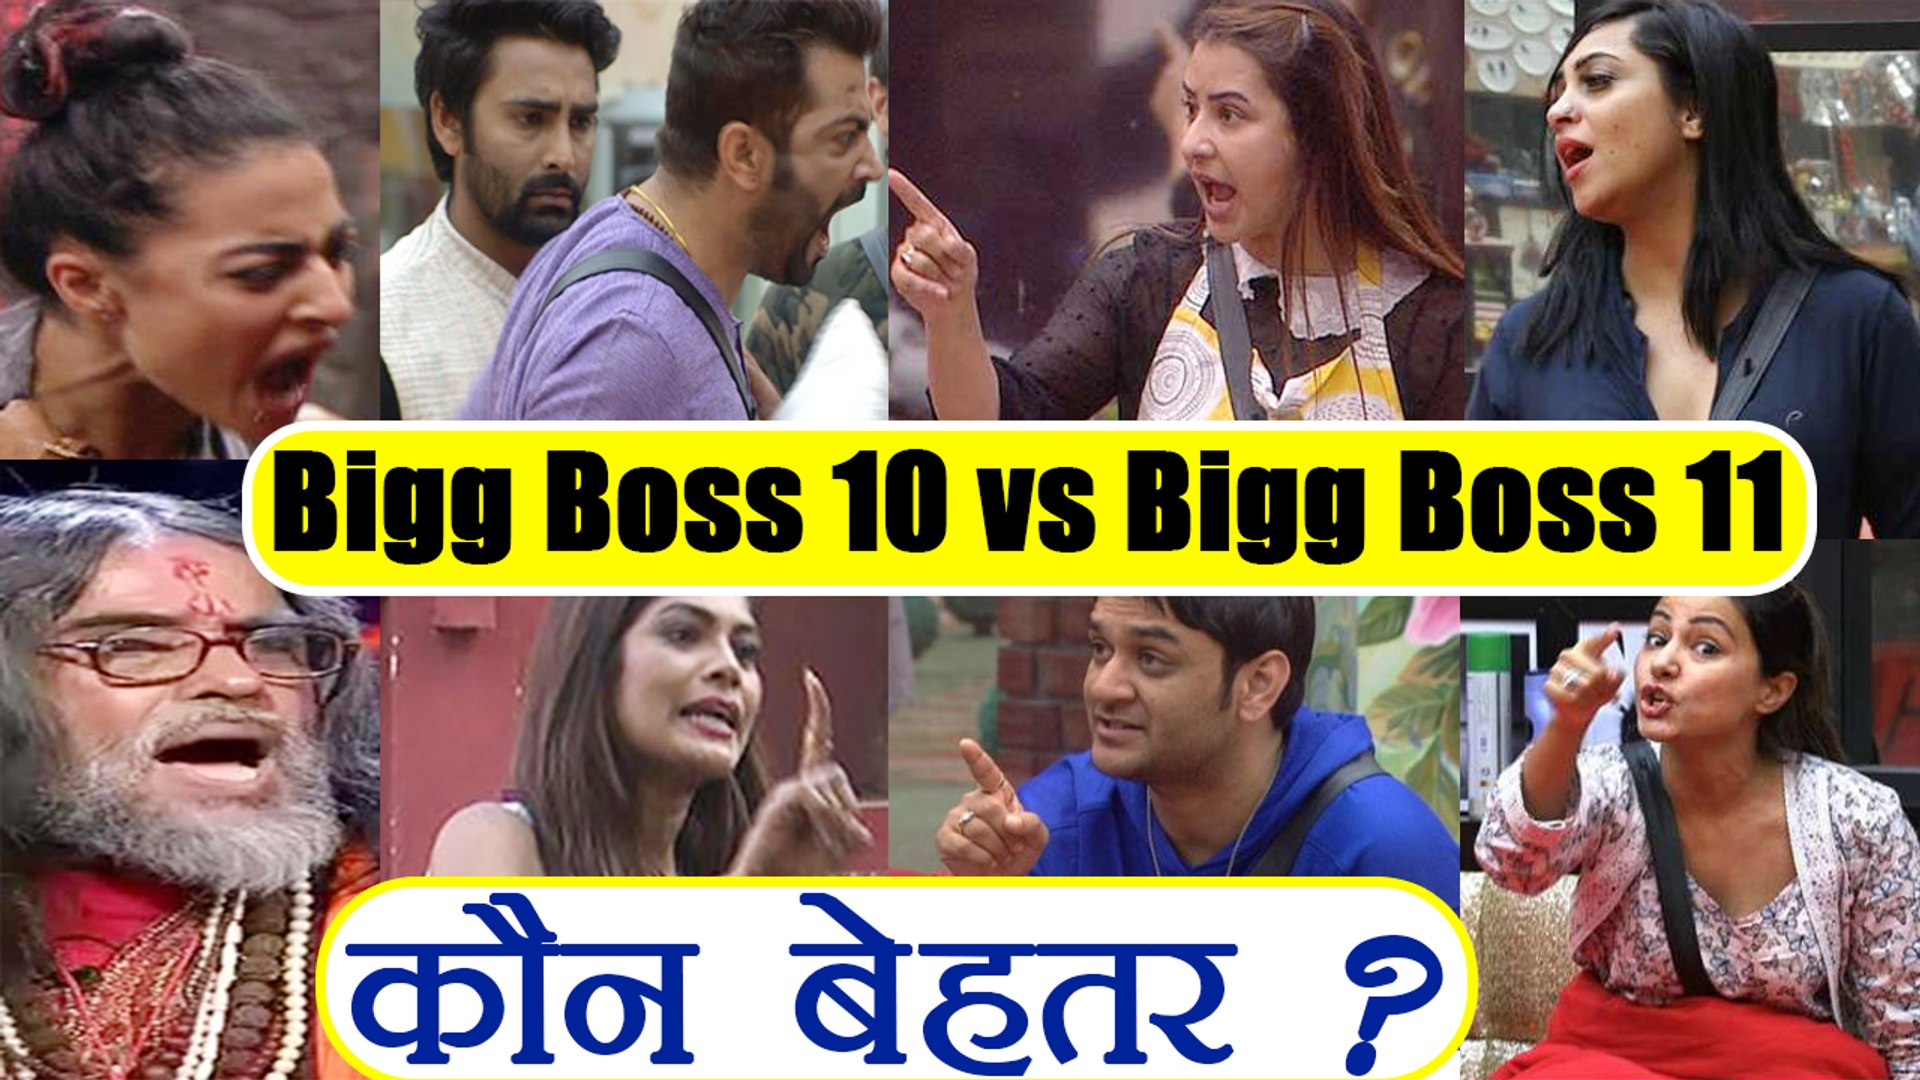 Bigg Boss 11 vs Bigg Boss 10: Which Season is BETTER?   FilmiBeat